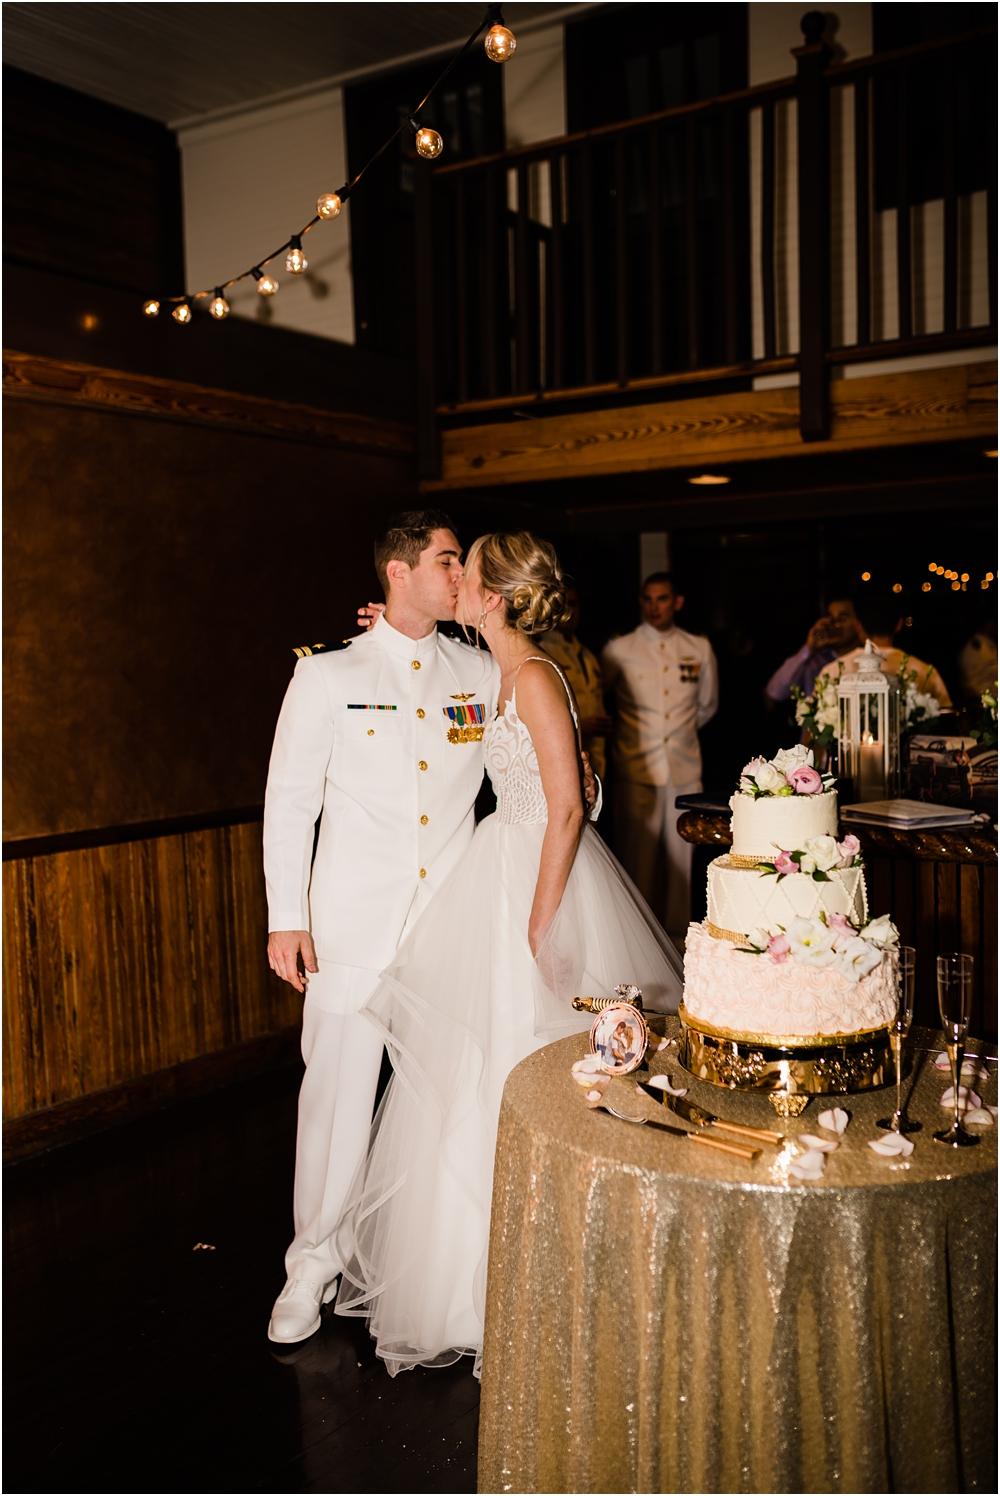 oconnor-pensacola-florida-wedding-photographer-kiersten-taylor-128.jpg